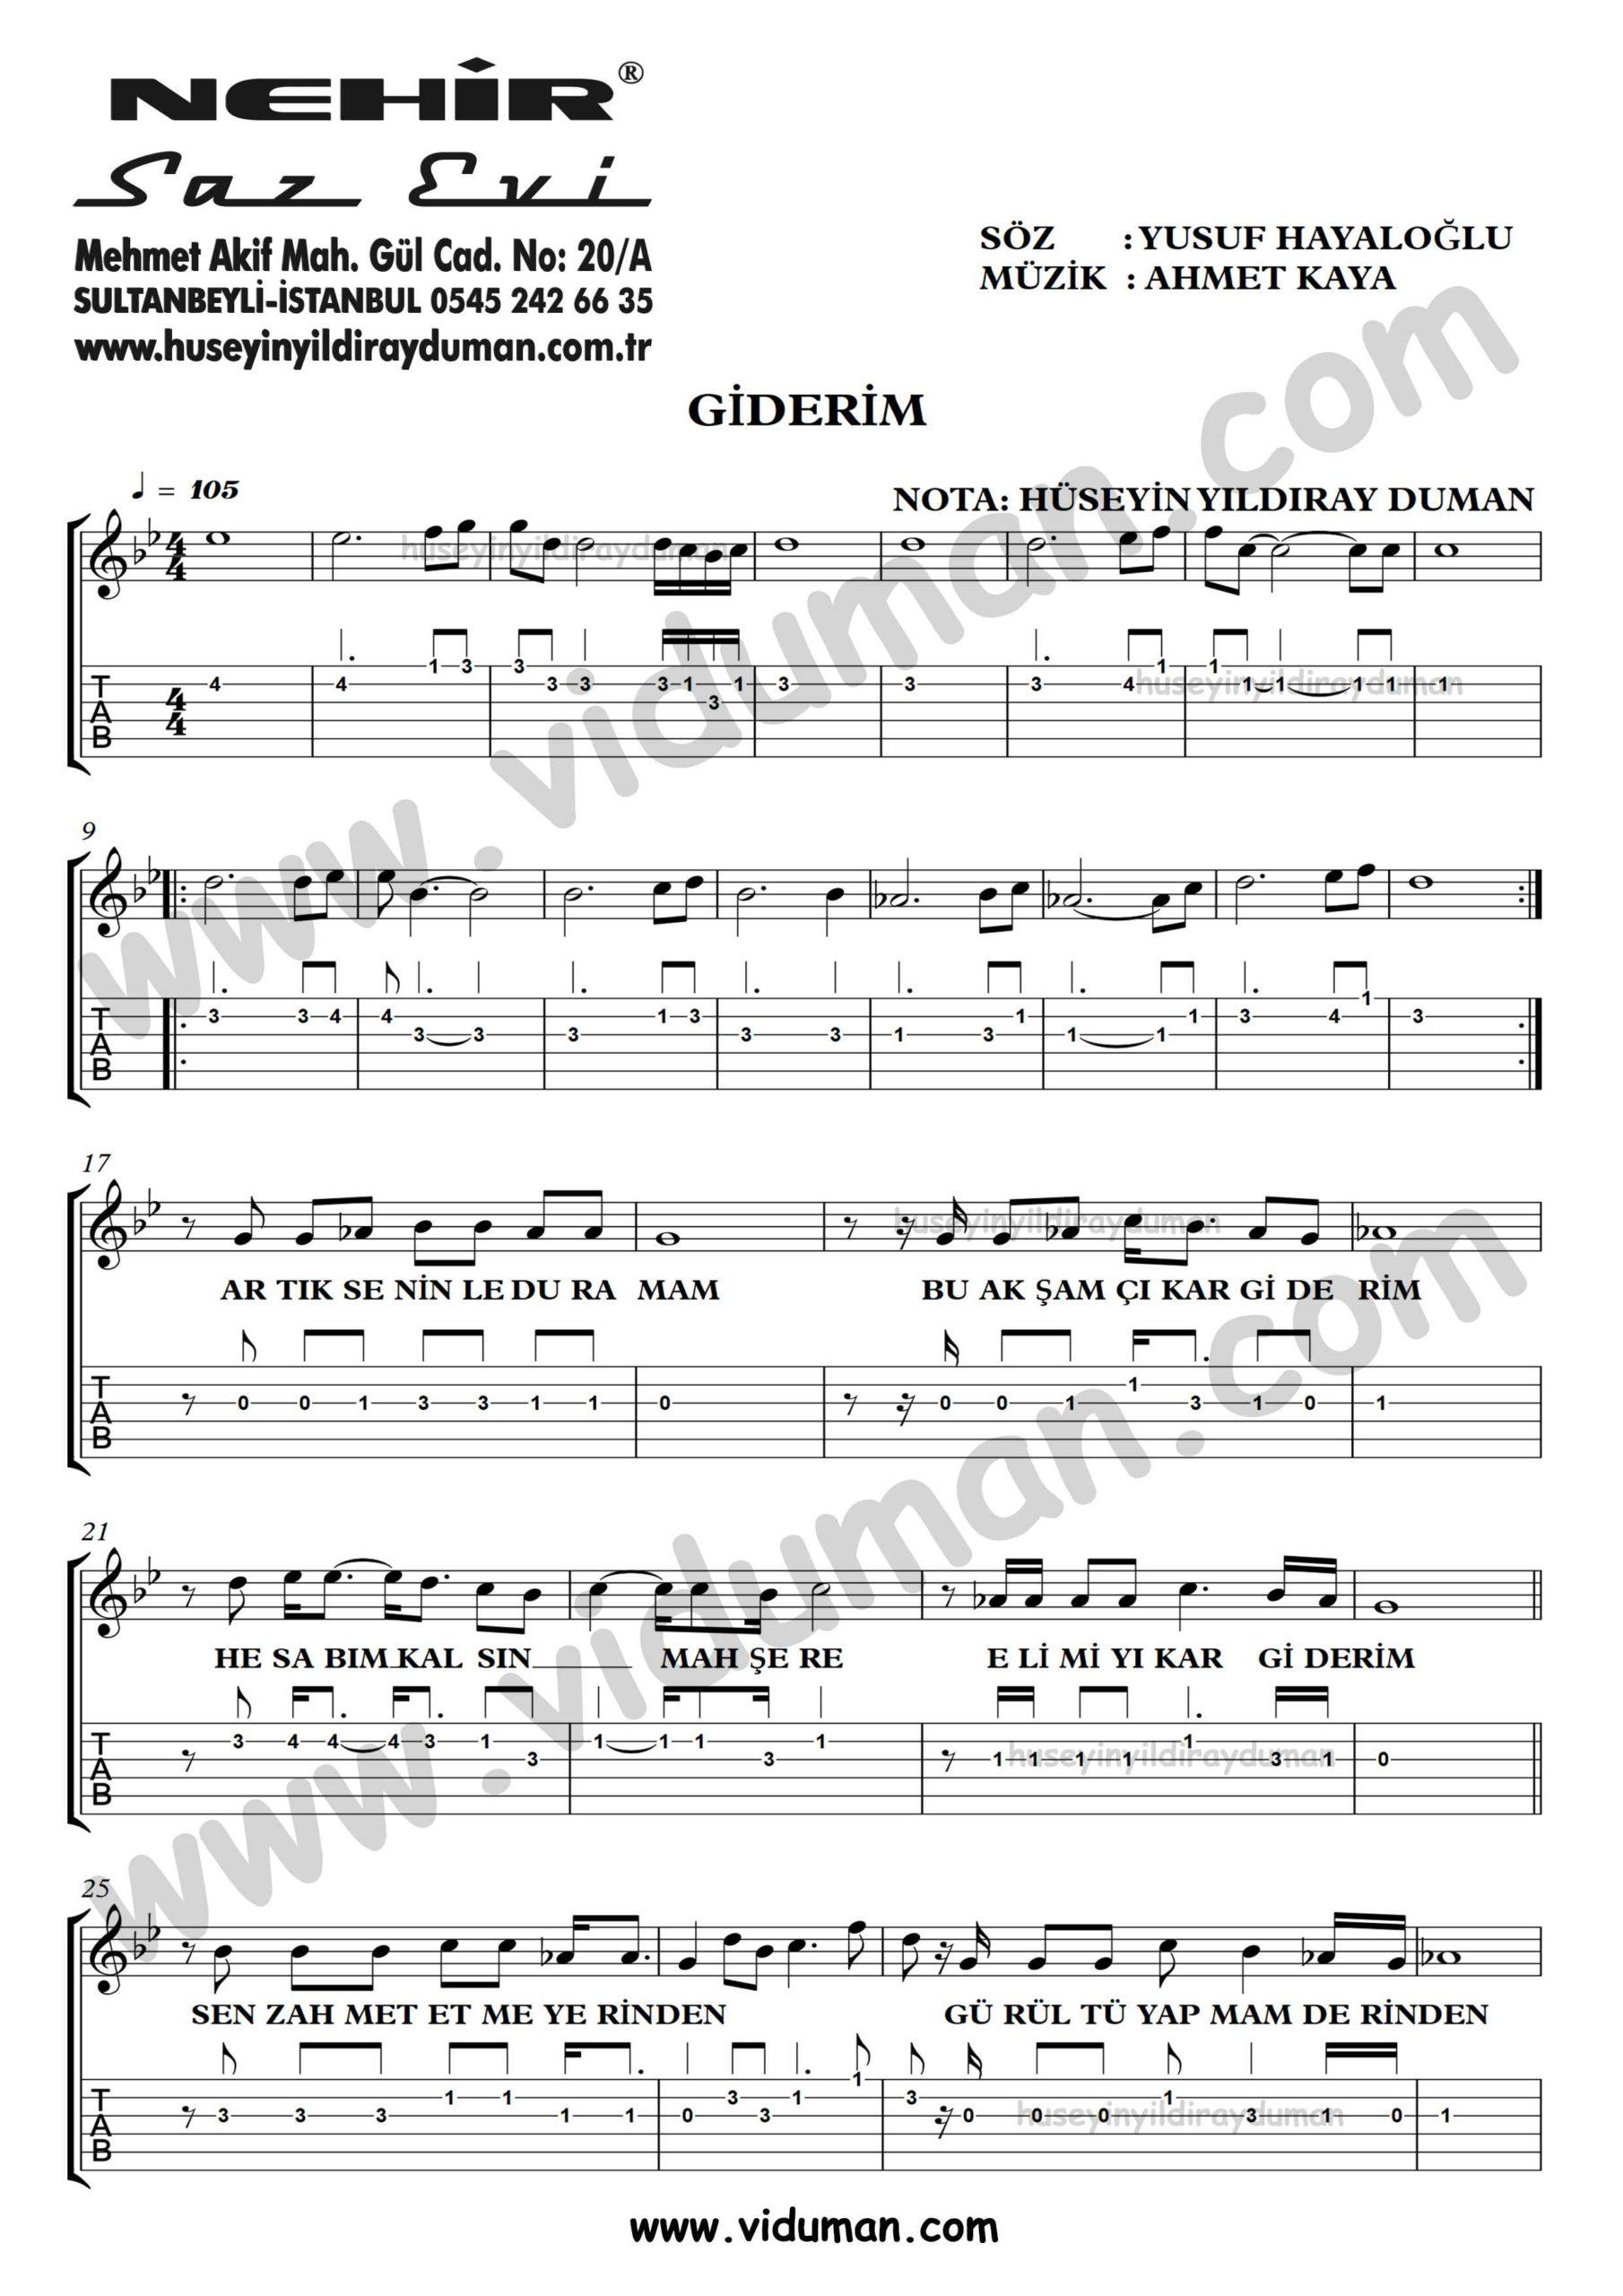 Giderim_1-Ahmet Kaya-Gitar Tab-Solo Notalari